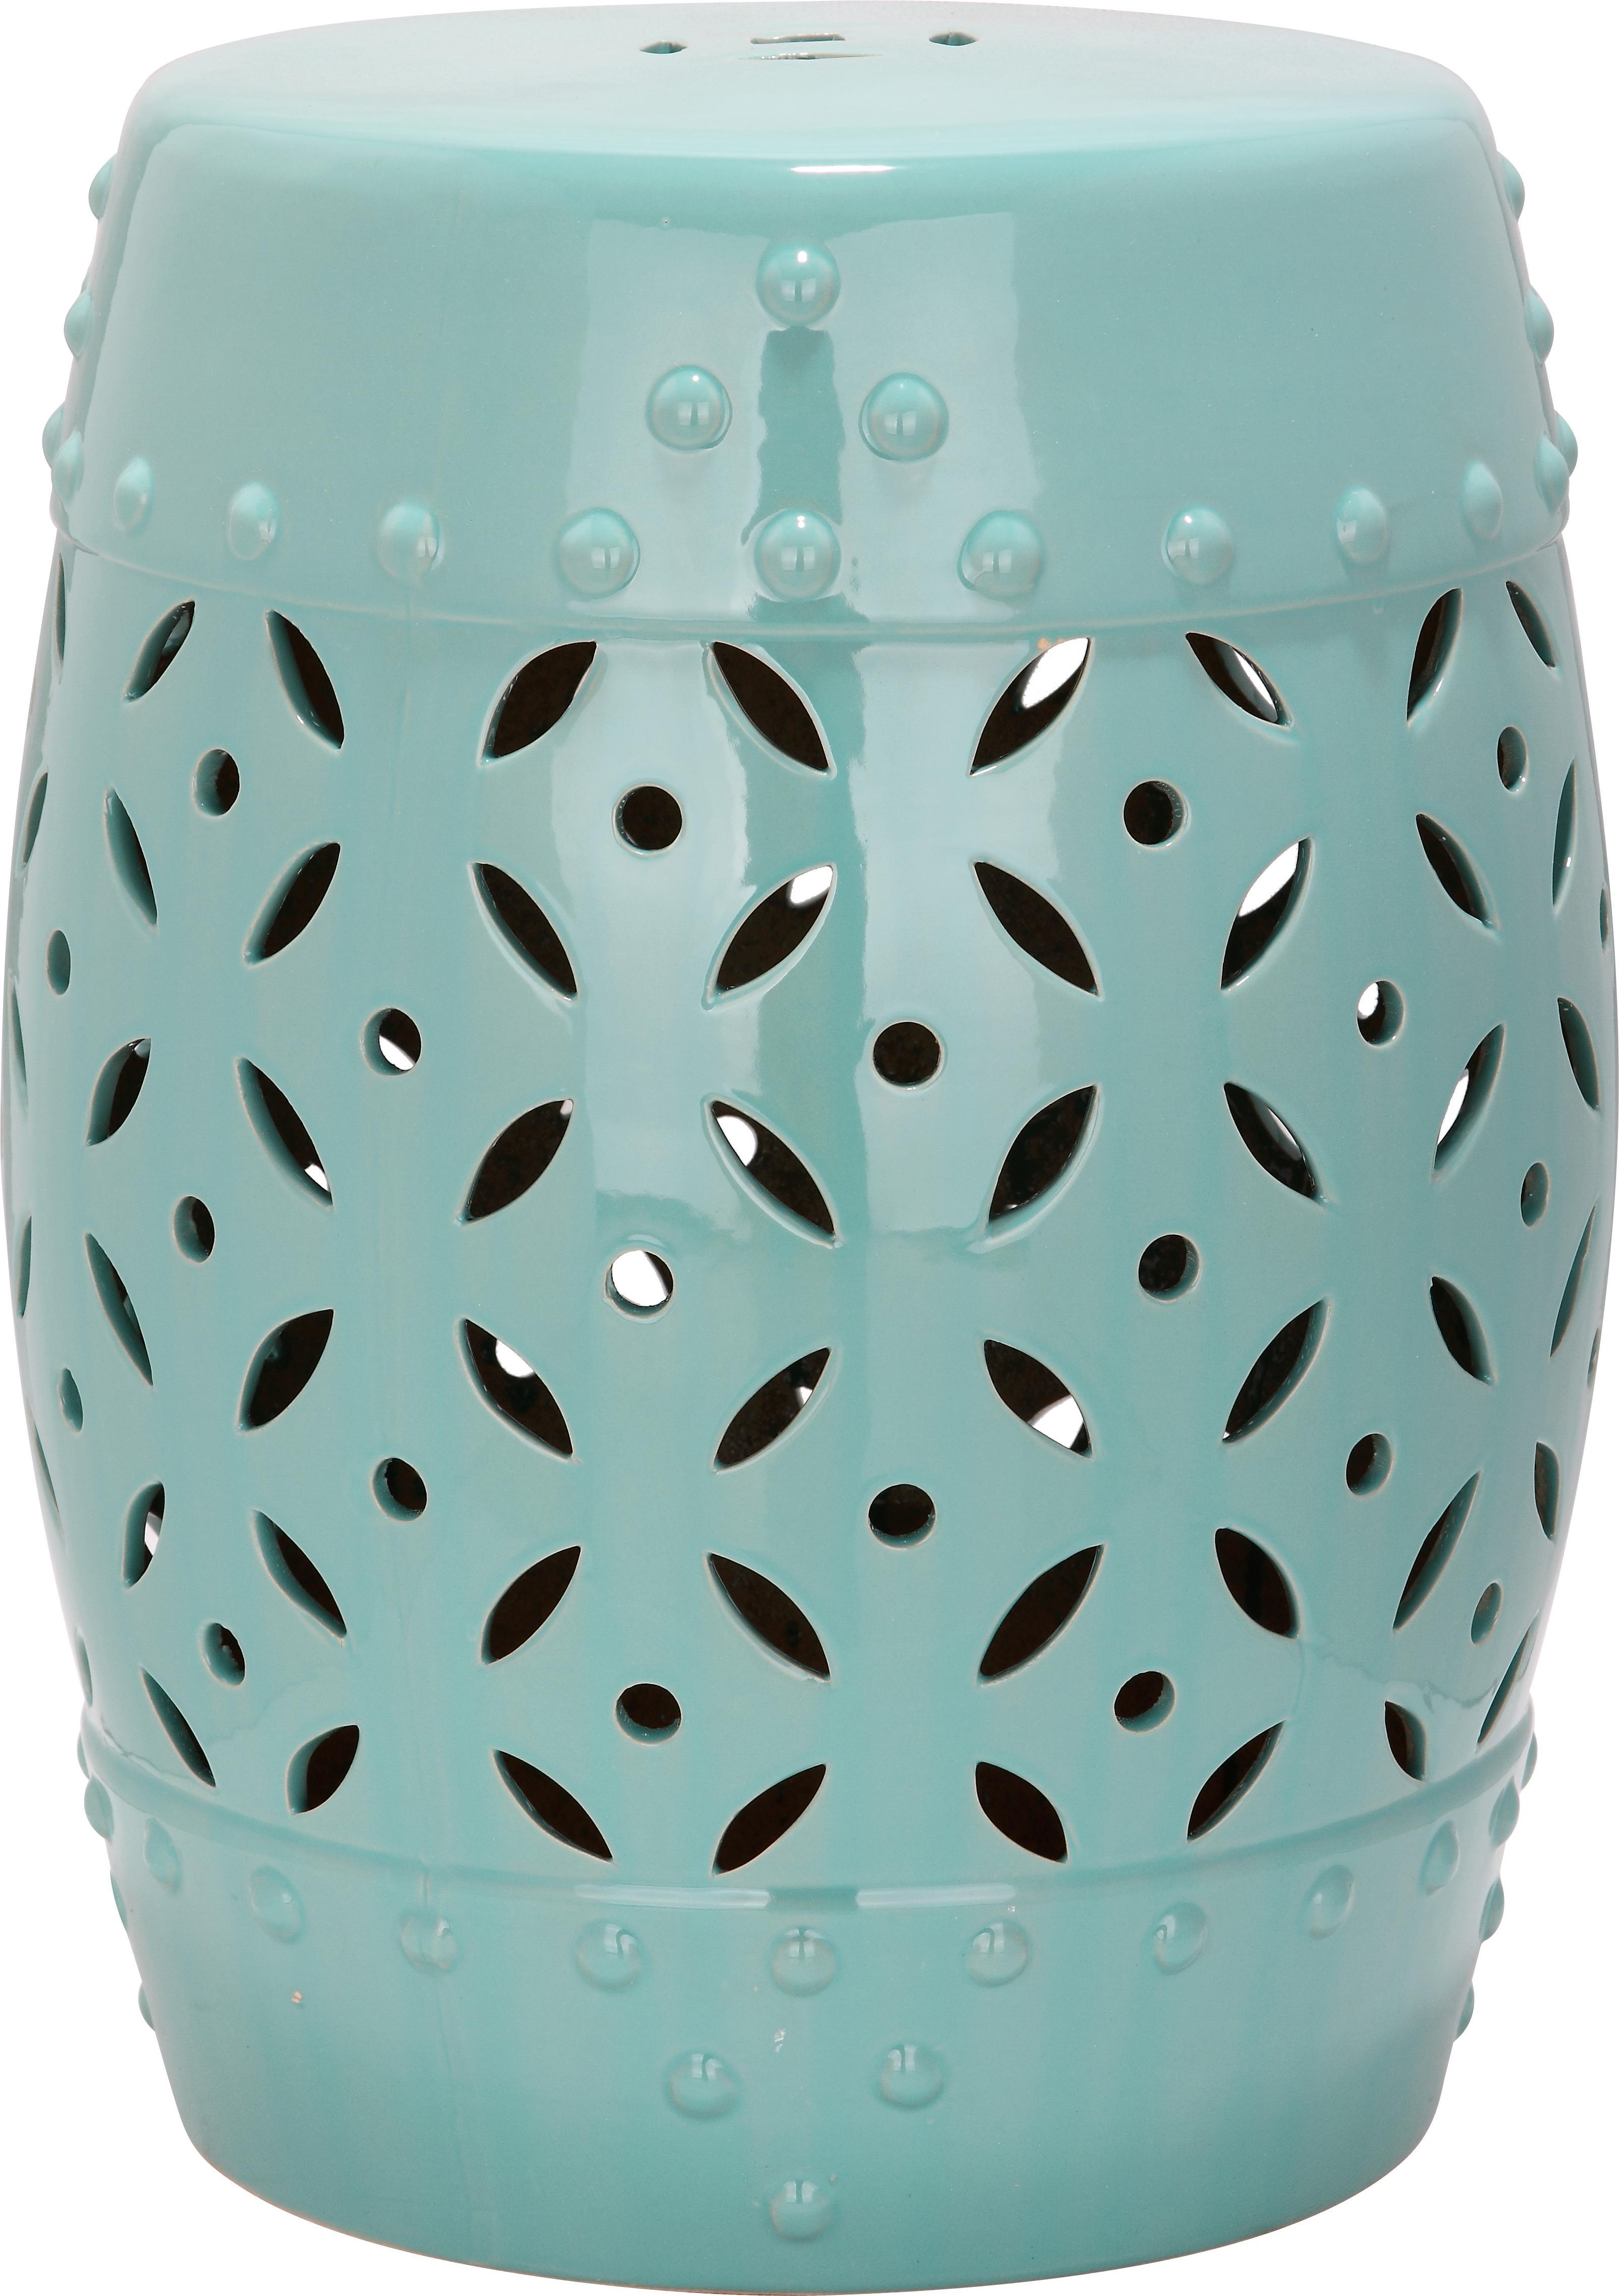 In- & outdoor kruk/bijzettafel Philine, Geglazuurd keramiek, Turquoise, Ø 33 x H 47 cm